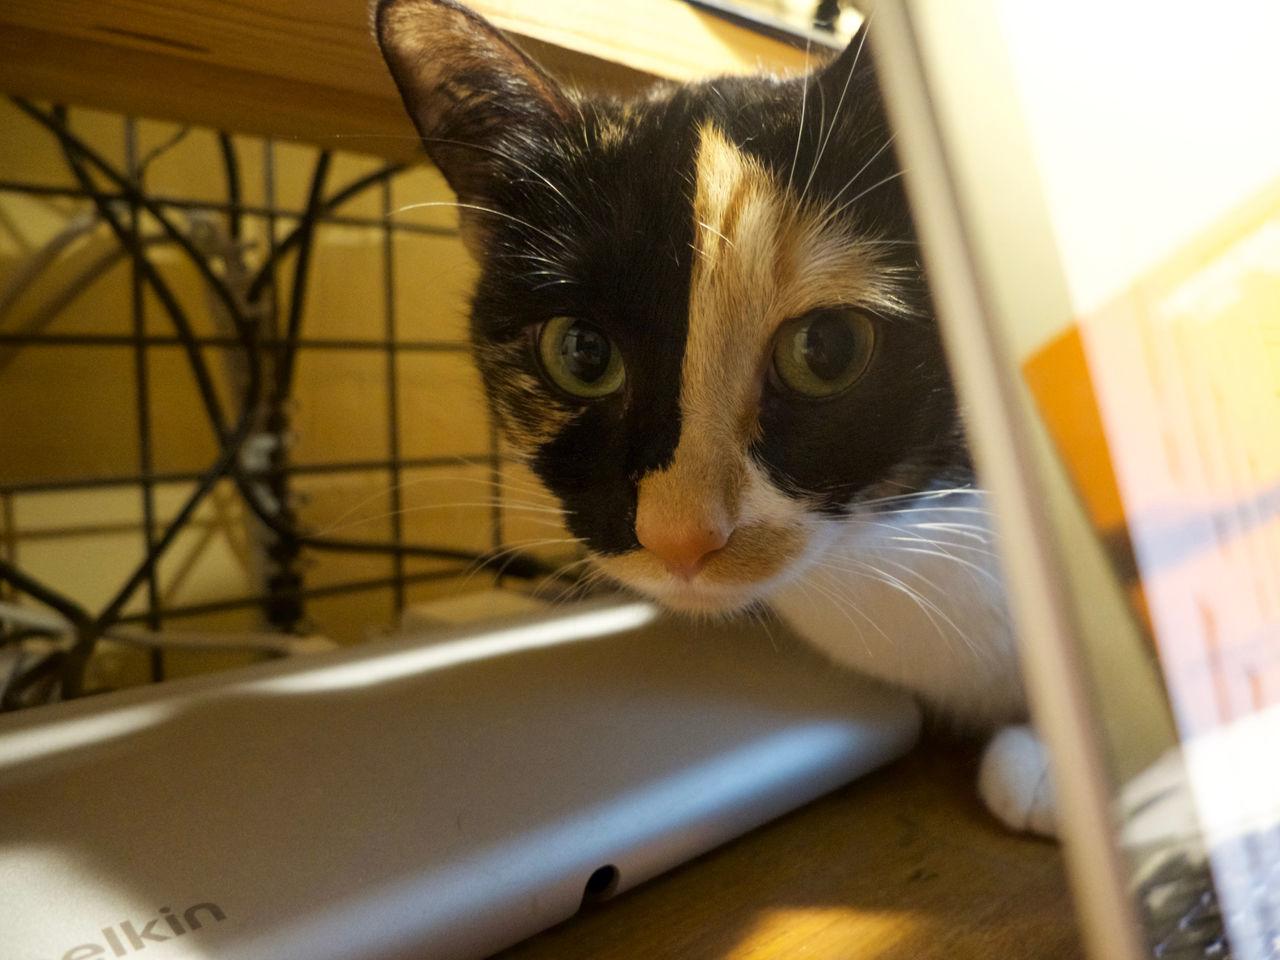 Animal Themes Cat Domestic Cat Feline One Animal Regard